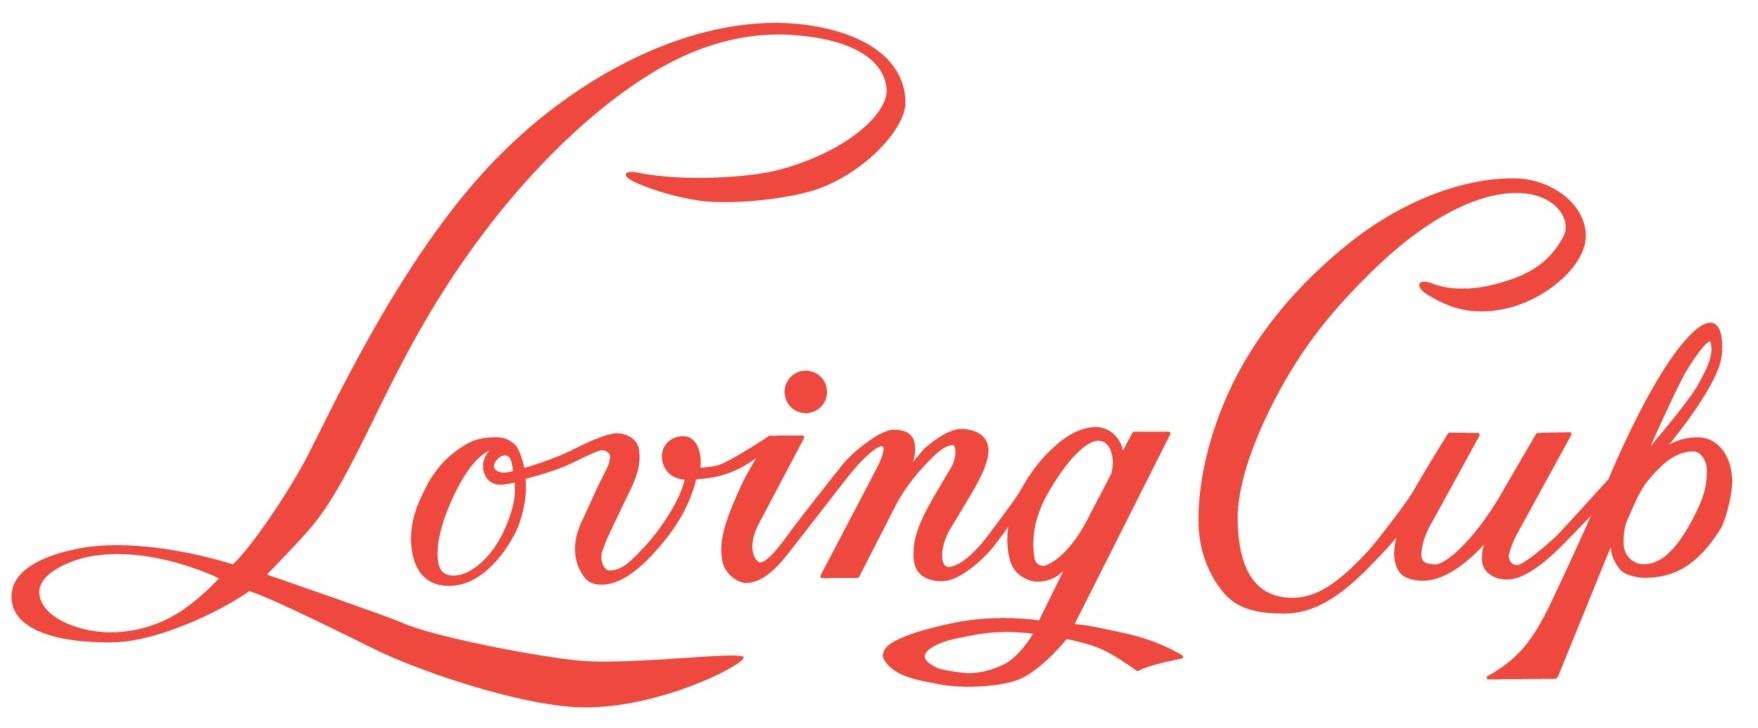 LovingCup_Logo-04.jpg